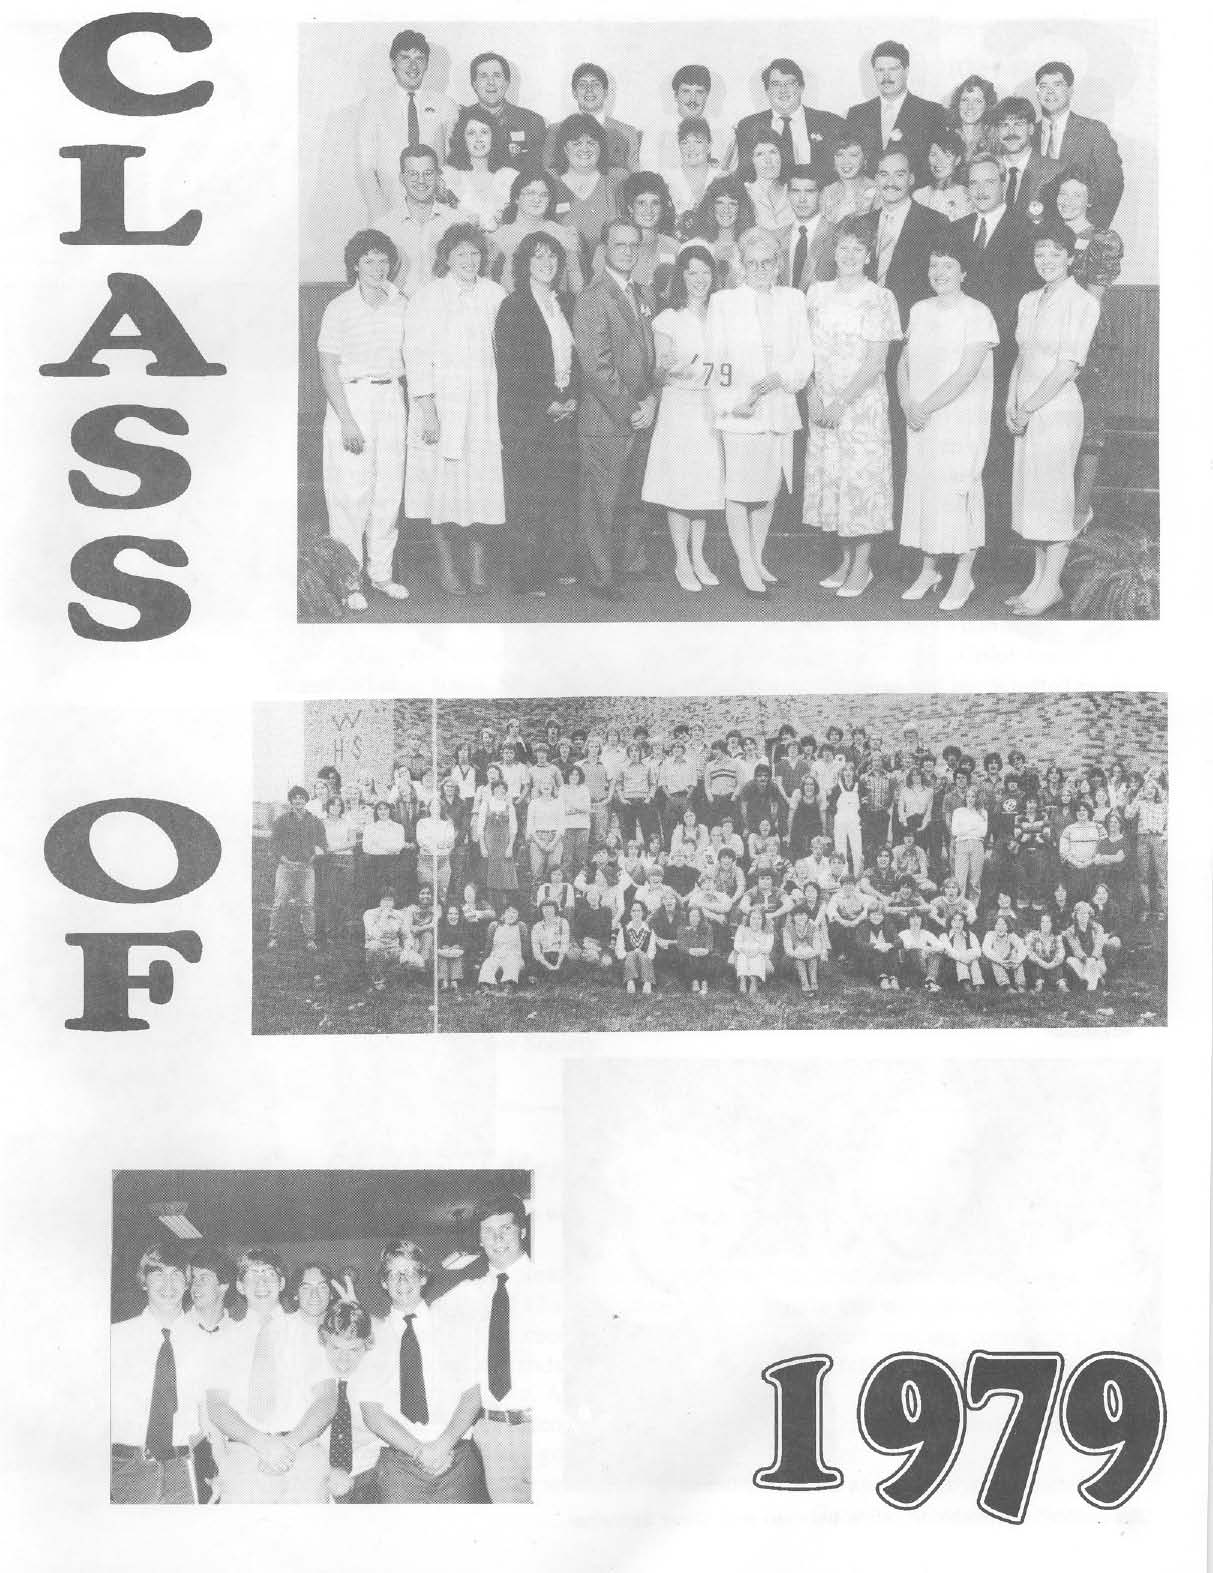 1994 1979